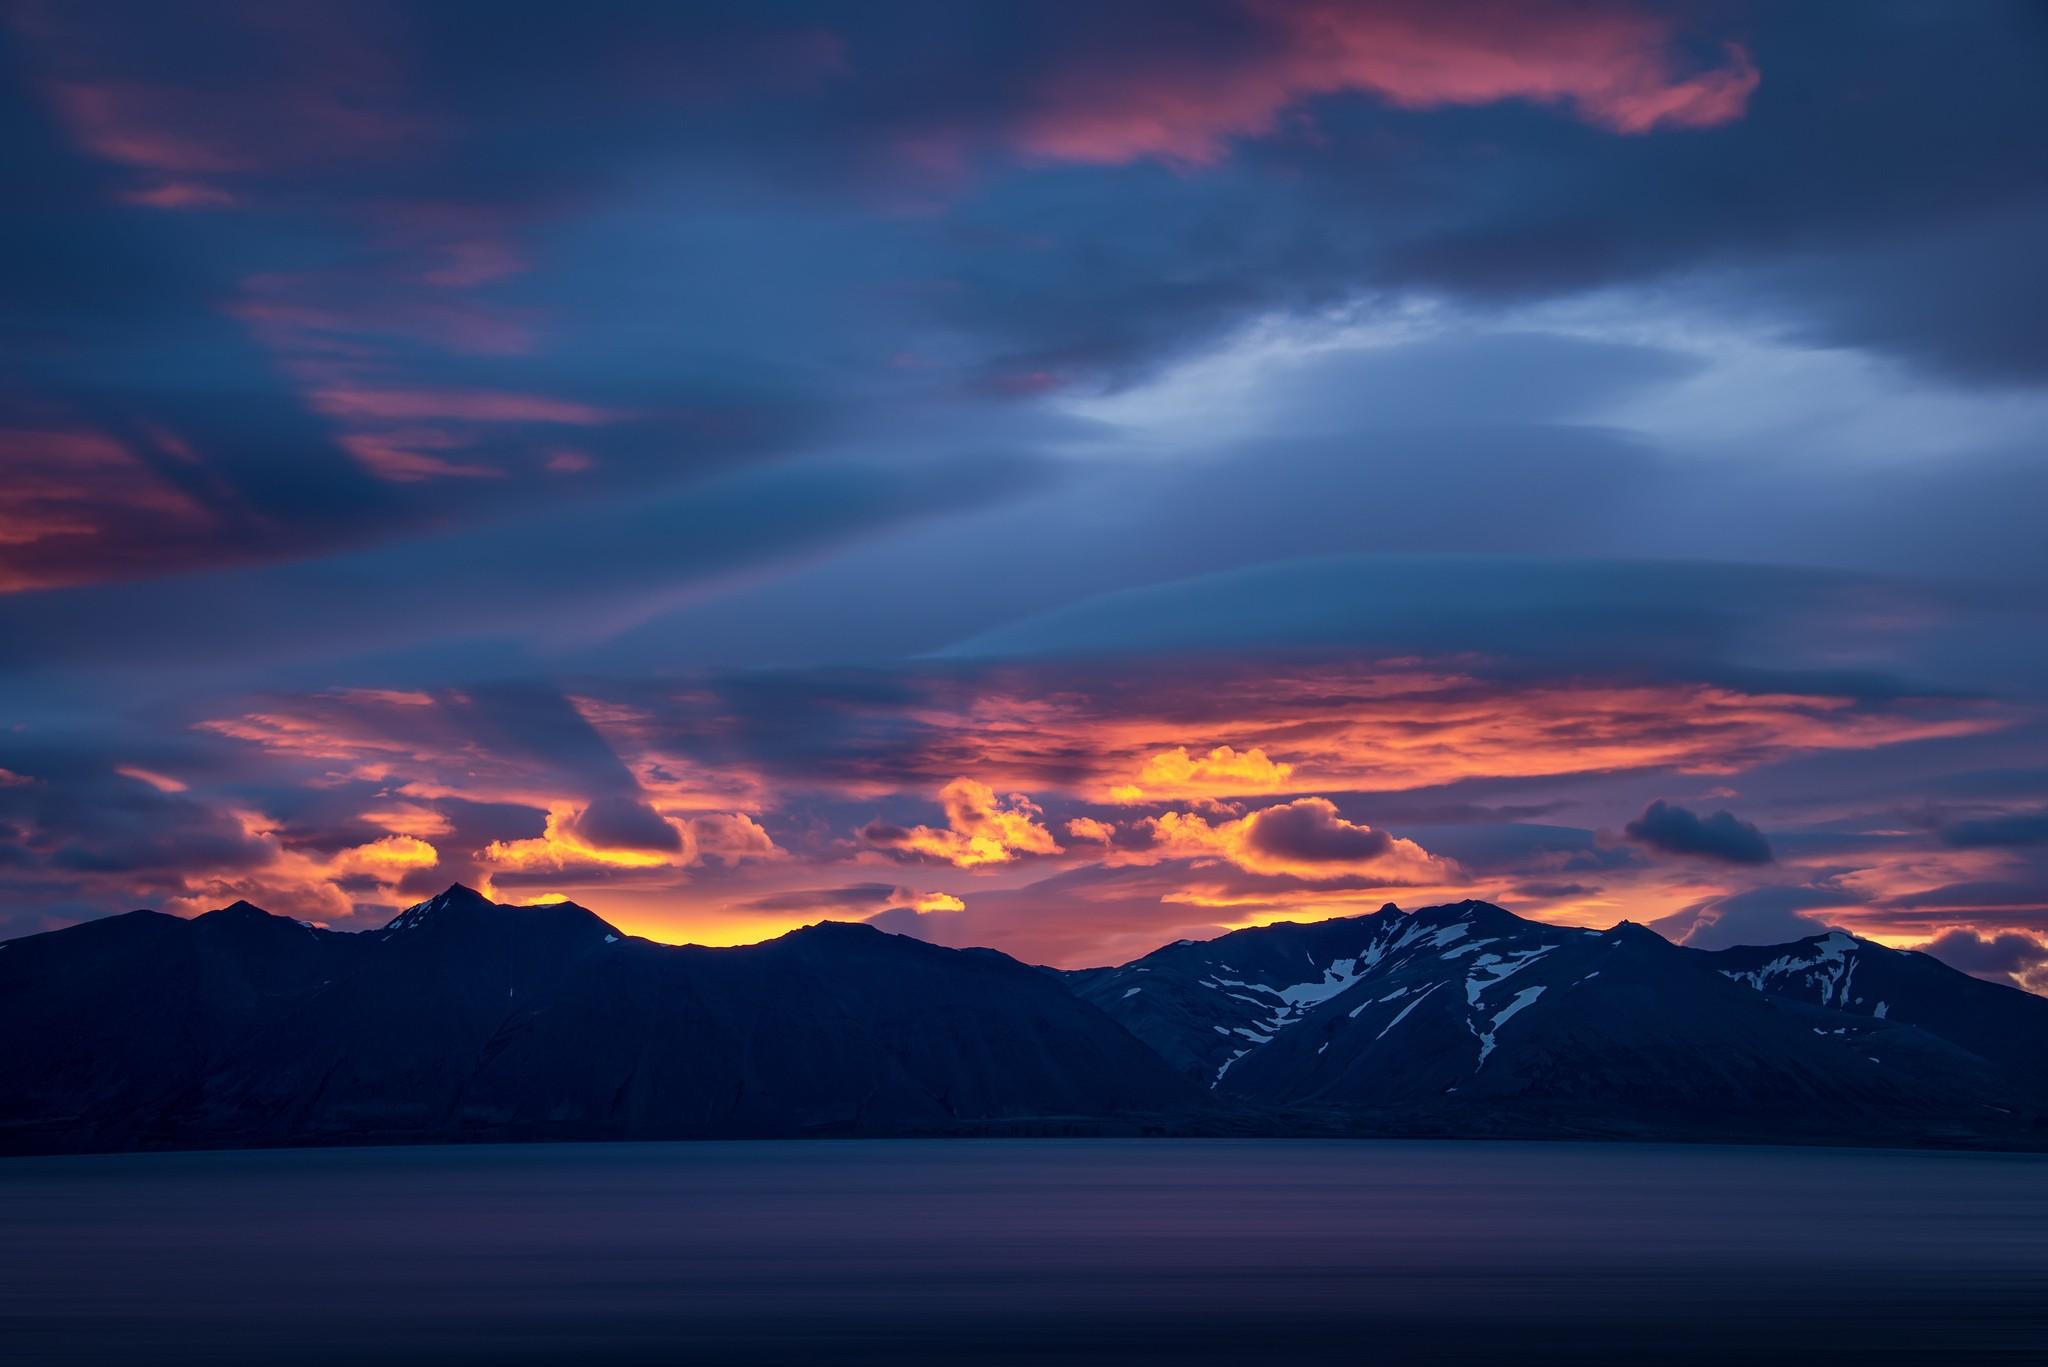 General 2048x1367 landscape lake clouds mountains sunrise